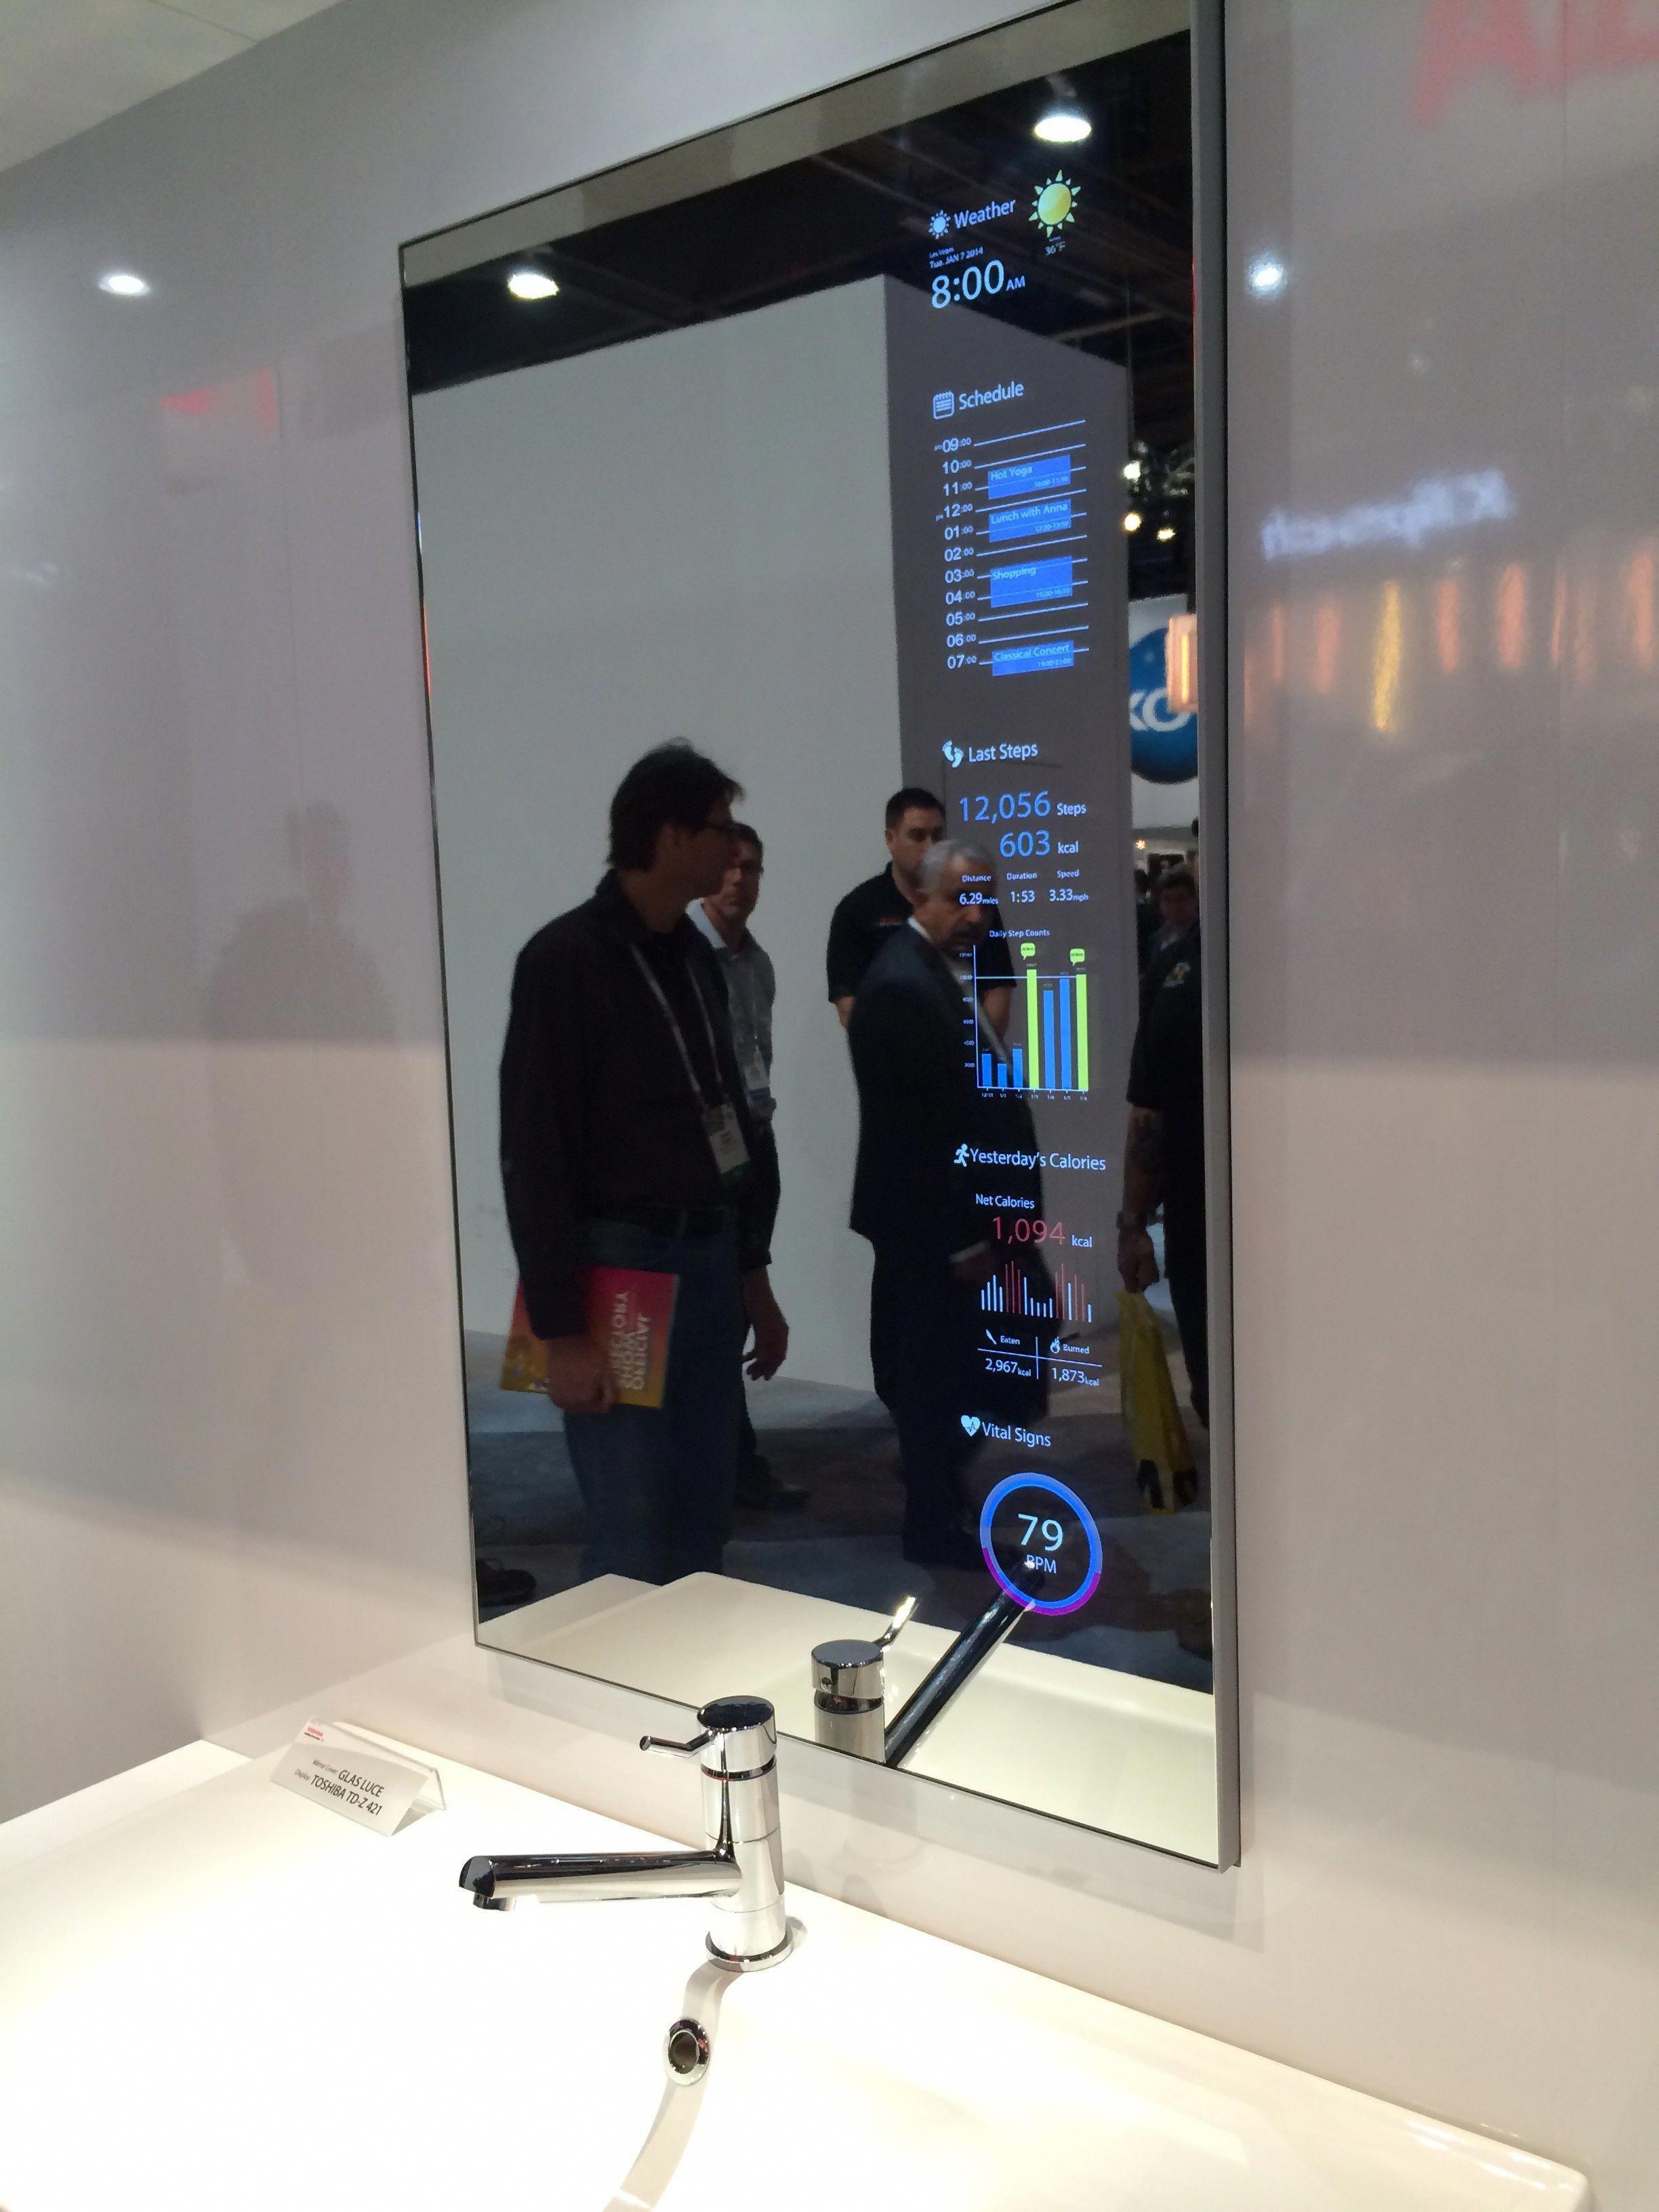 Smart Mirror Display Smarthome Home Technology Smart Home